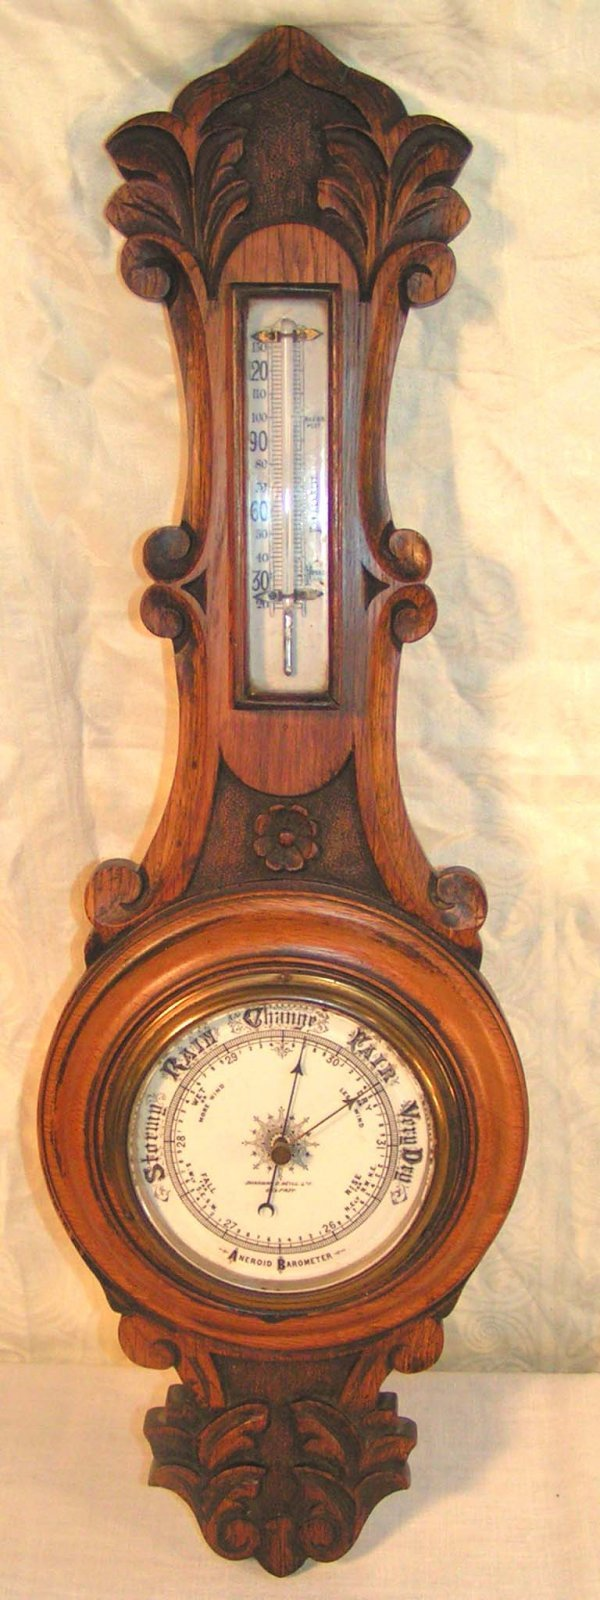 9: carved oak barometer marked sharman d neill ltd belf